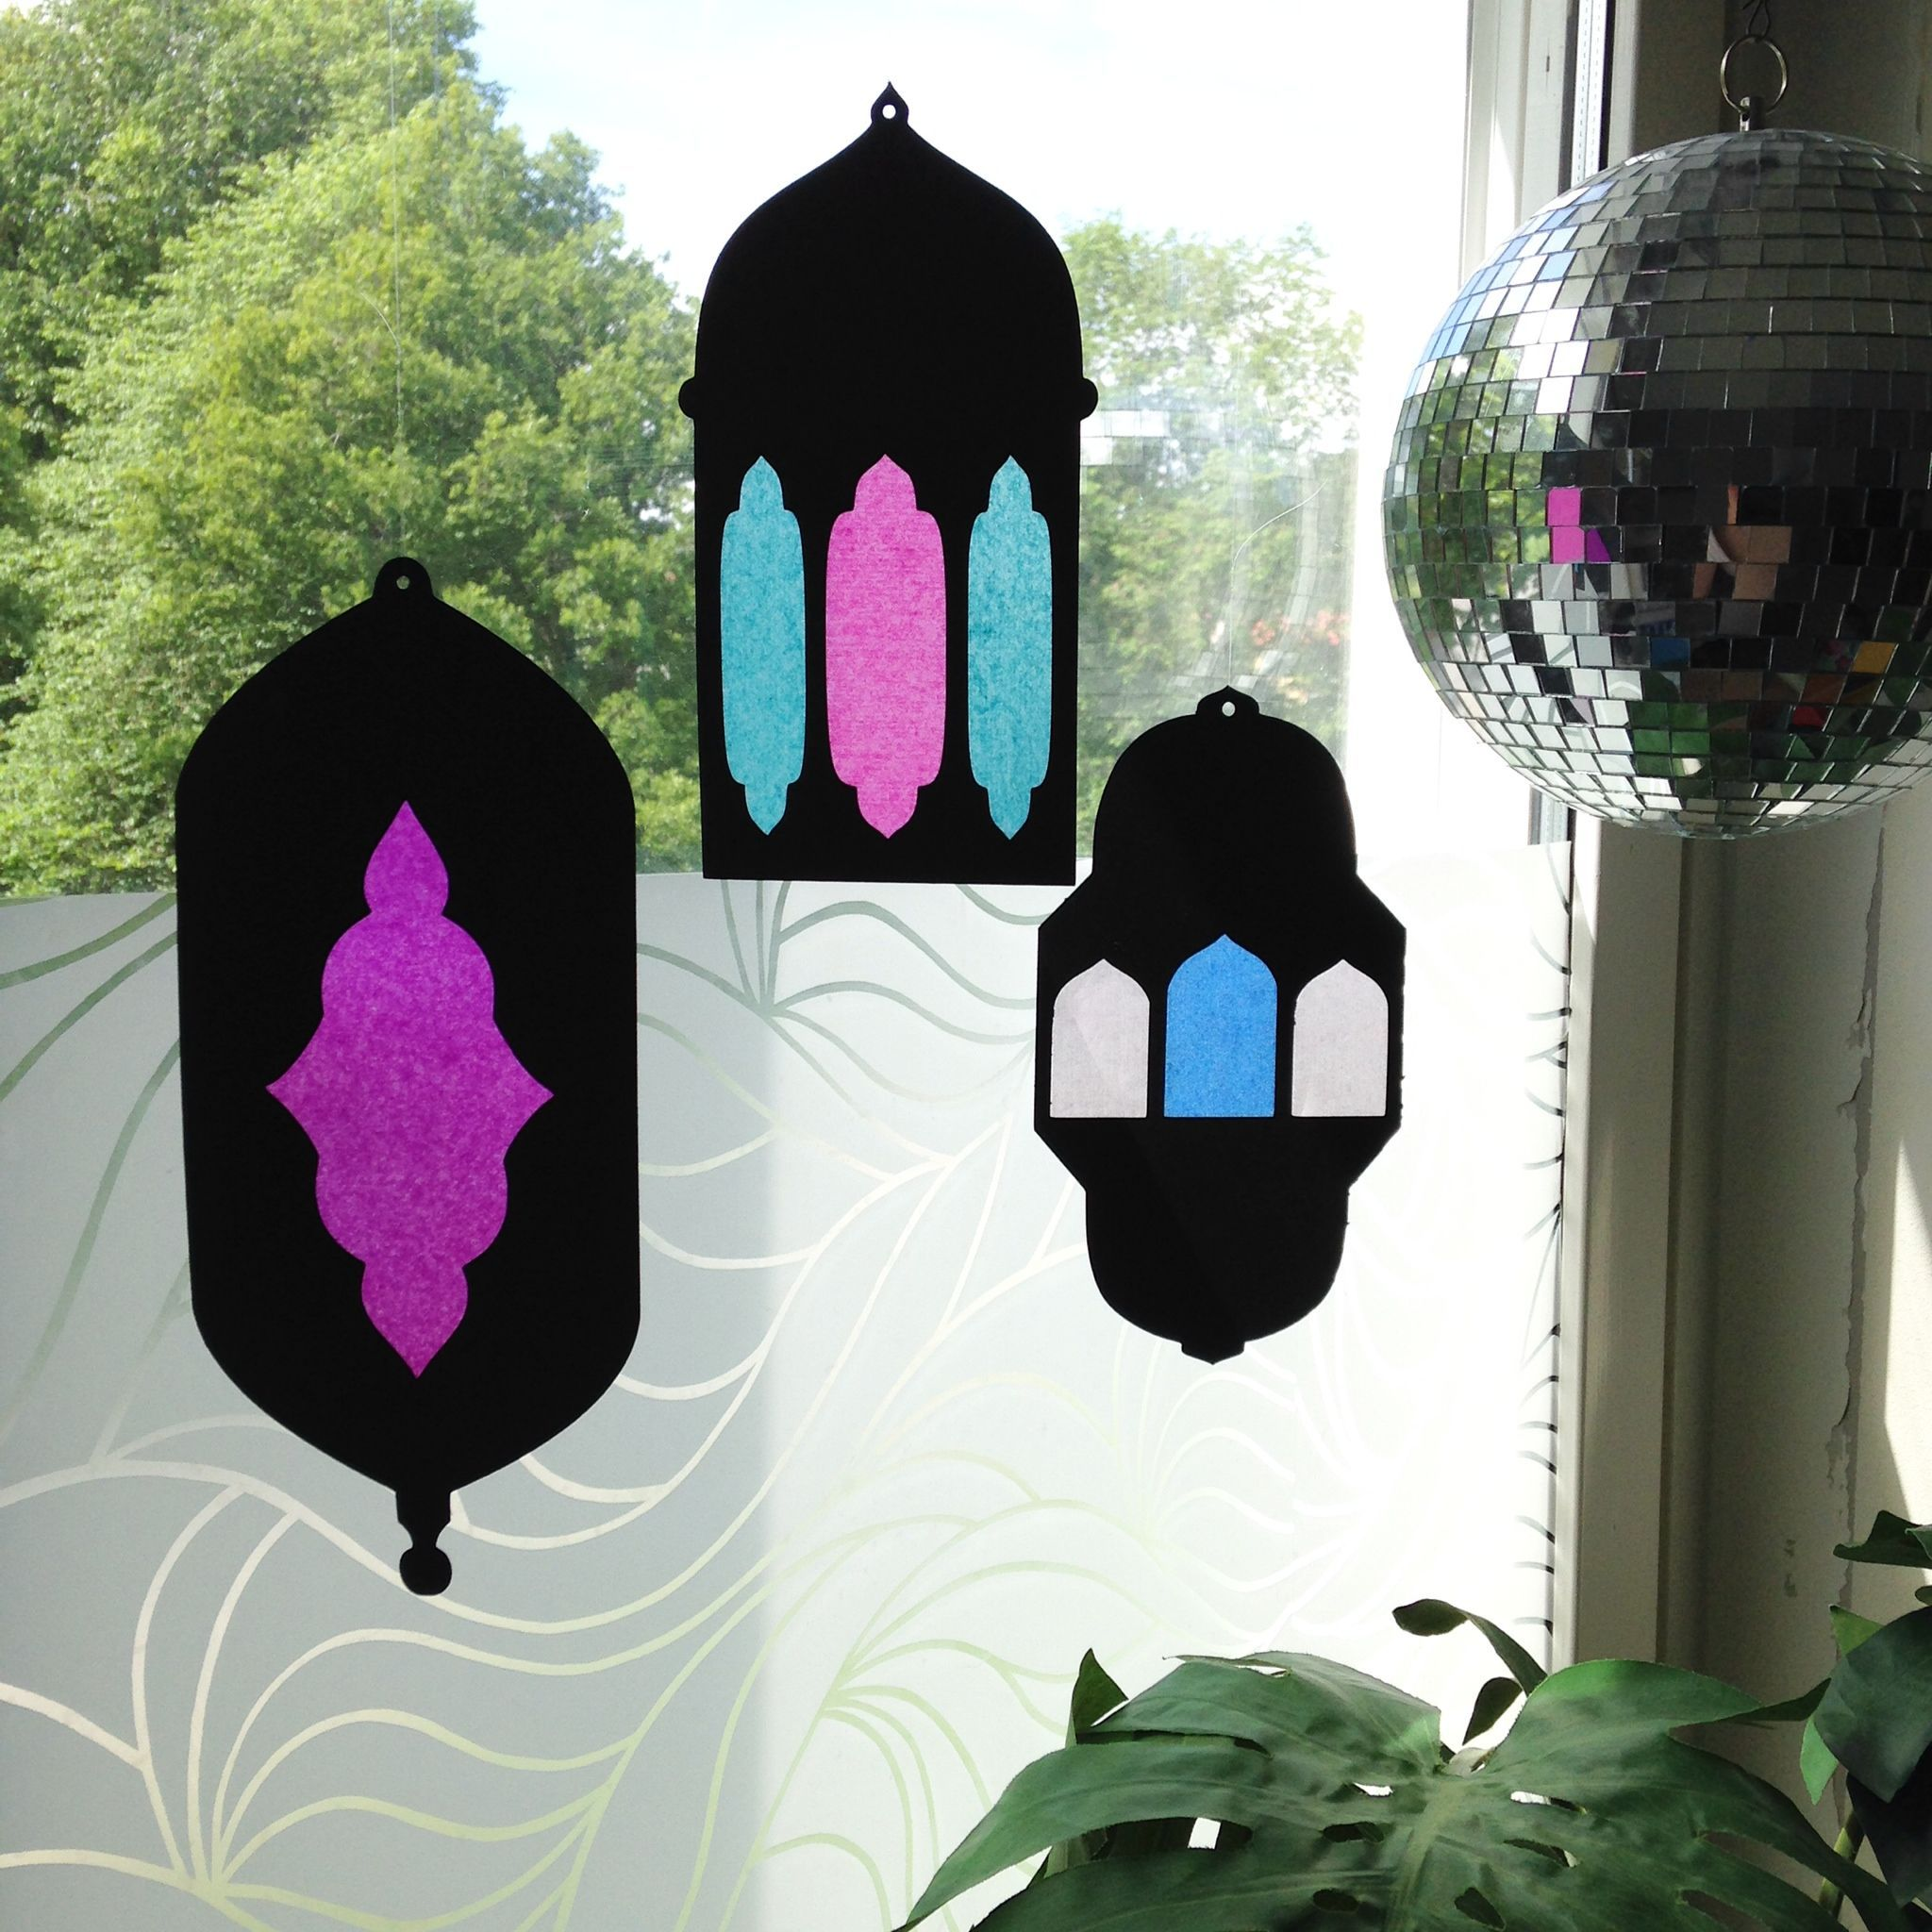 17 Simple Ramadan Decoration Ideas You Can Do At Home Ramadan Crafts Ramadan Activities Ramadan Decorations